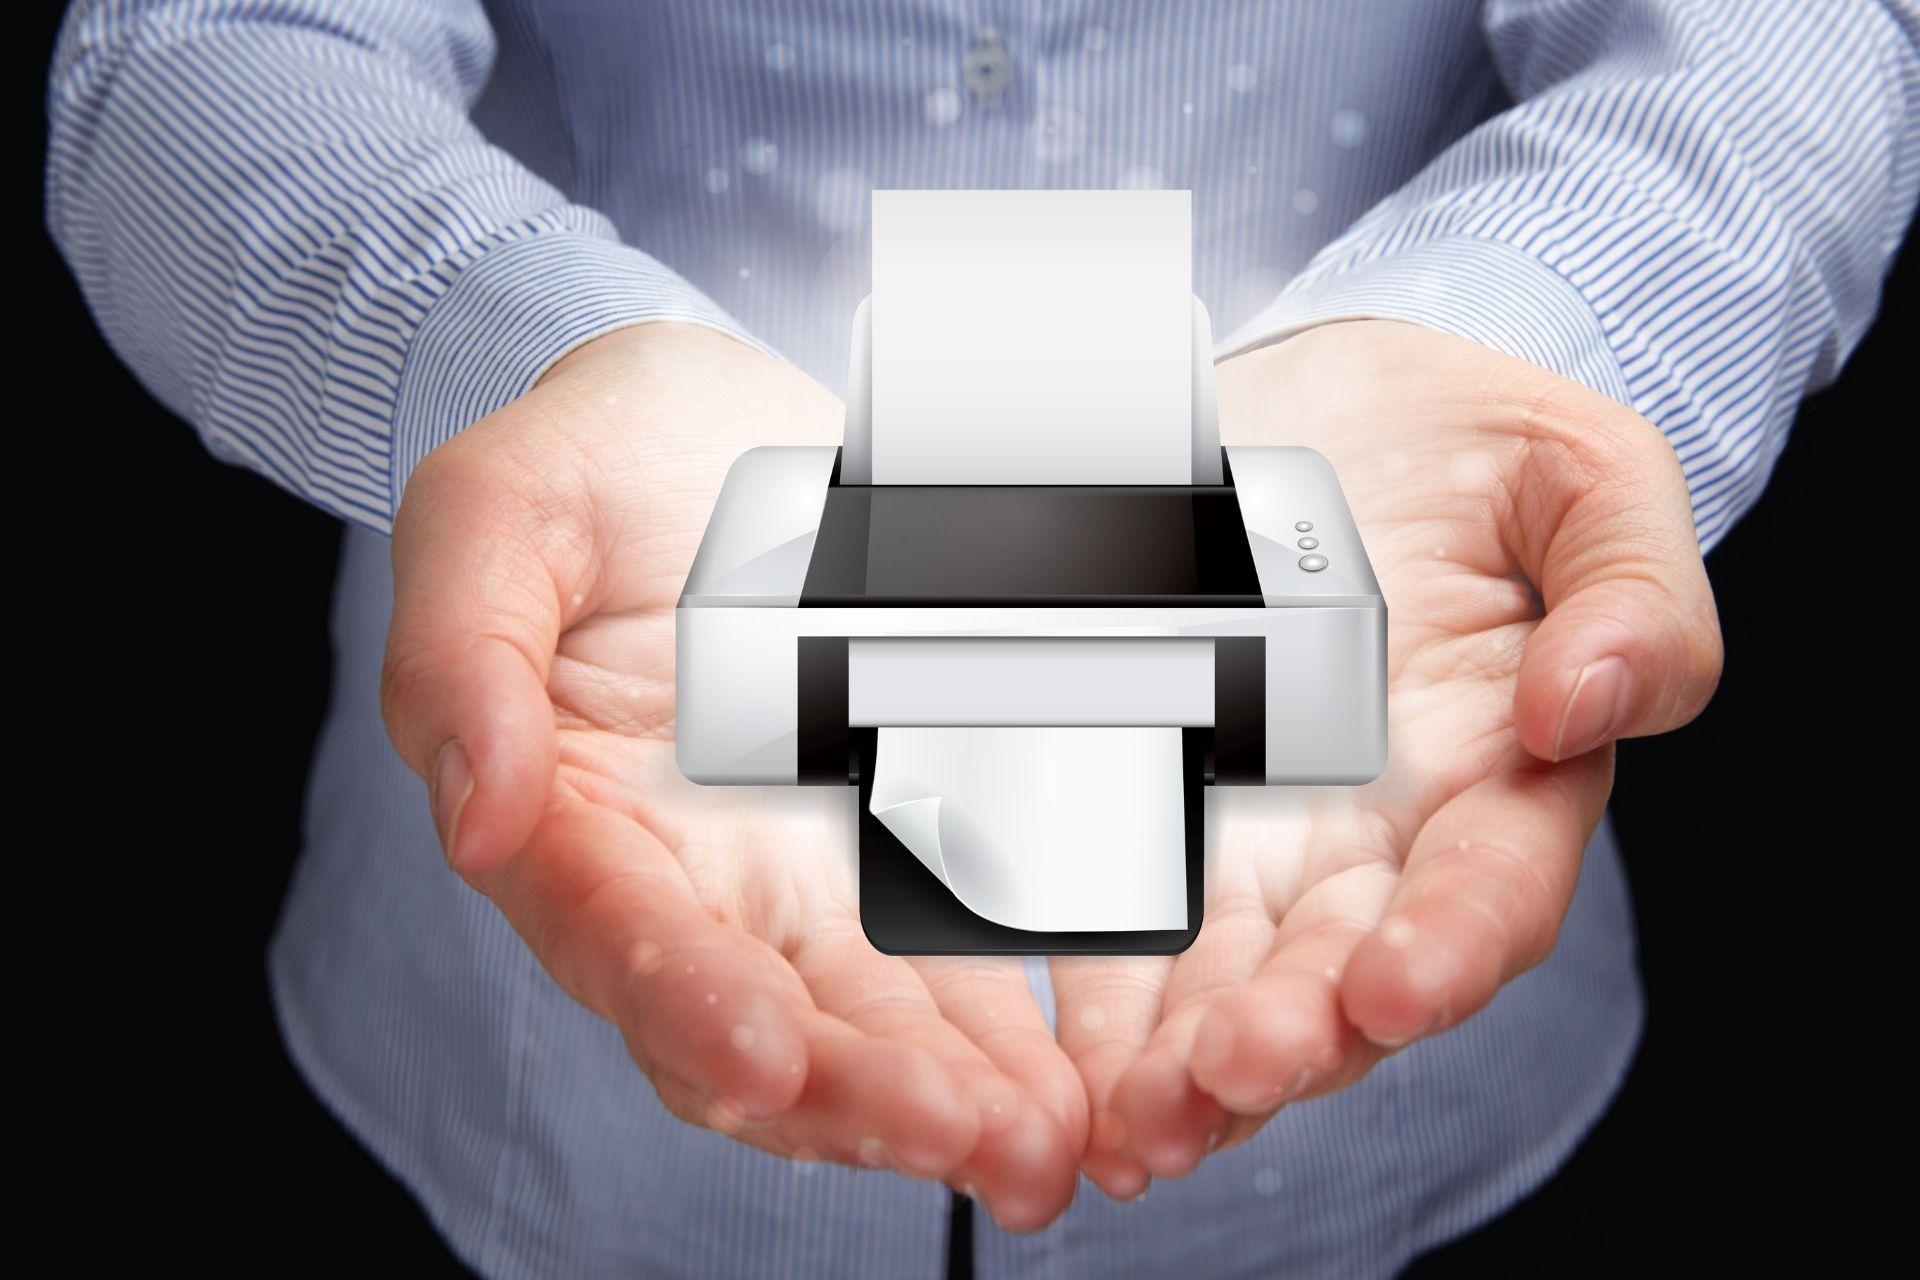 A person holding a printer icon